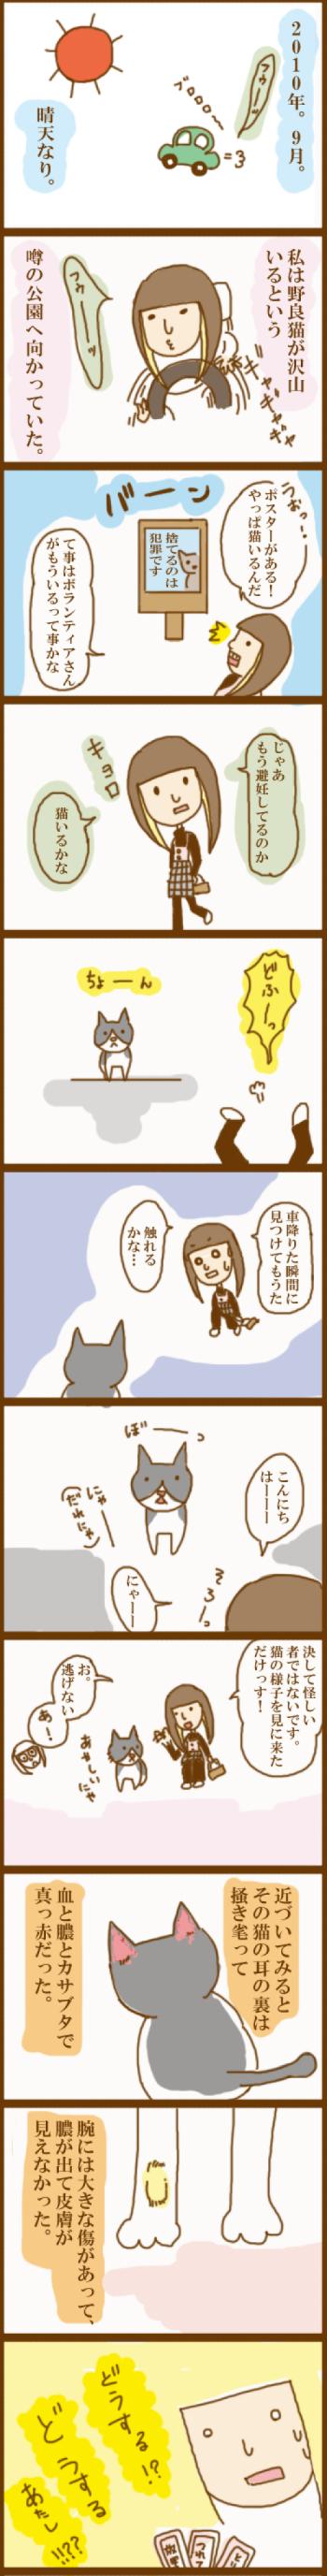 f:id:suzuokayu:20201011195021j:plain